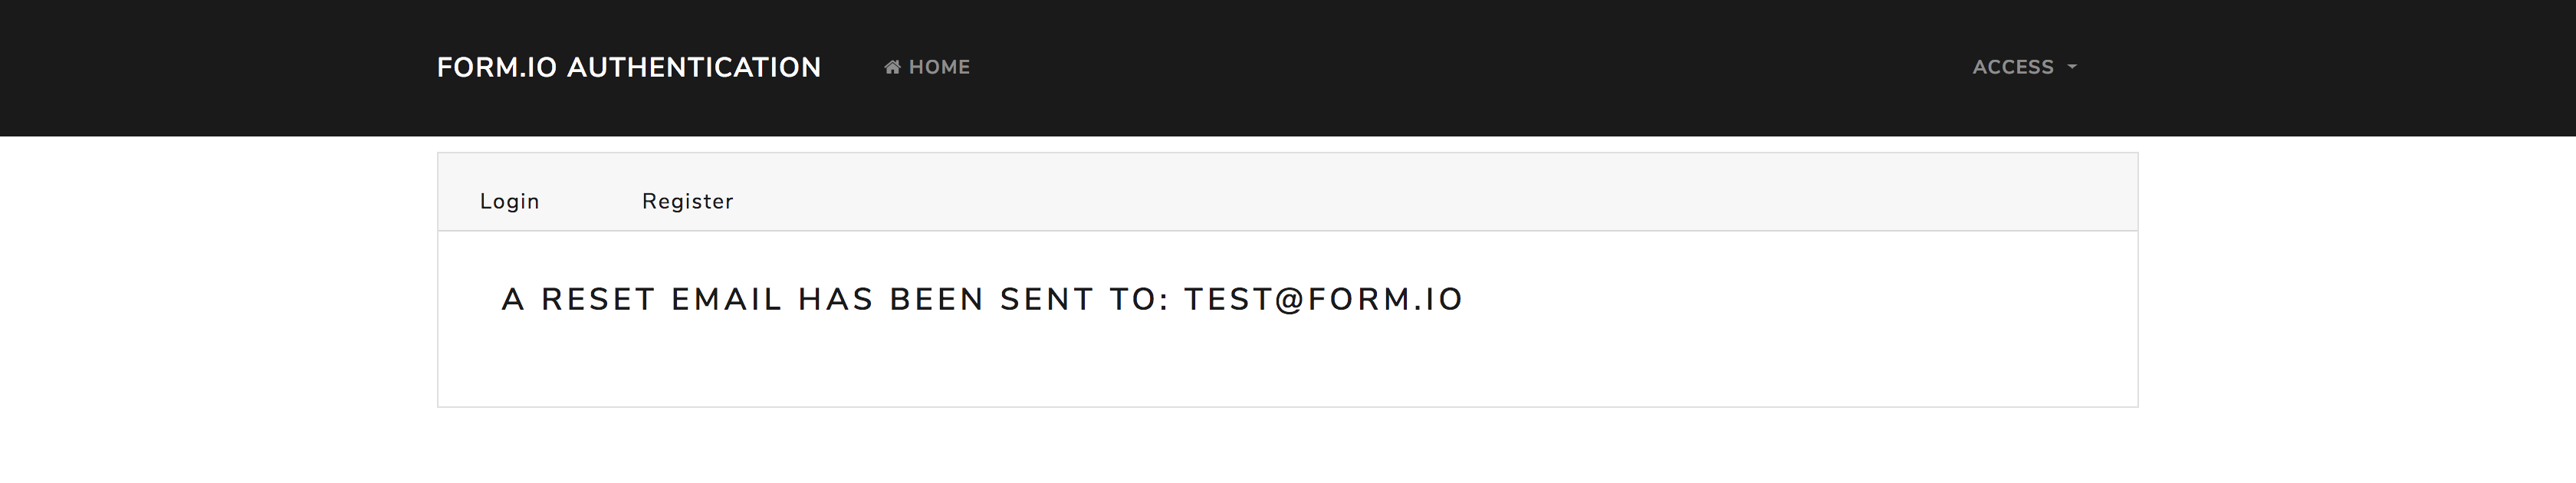 Form io Help | Tutorials